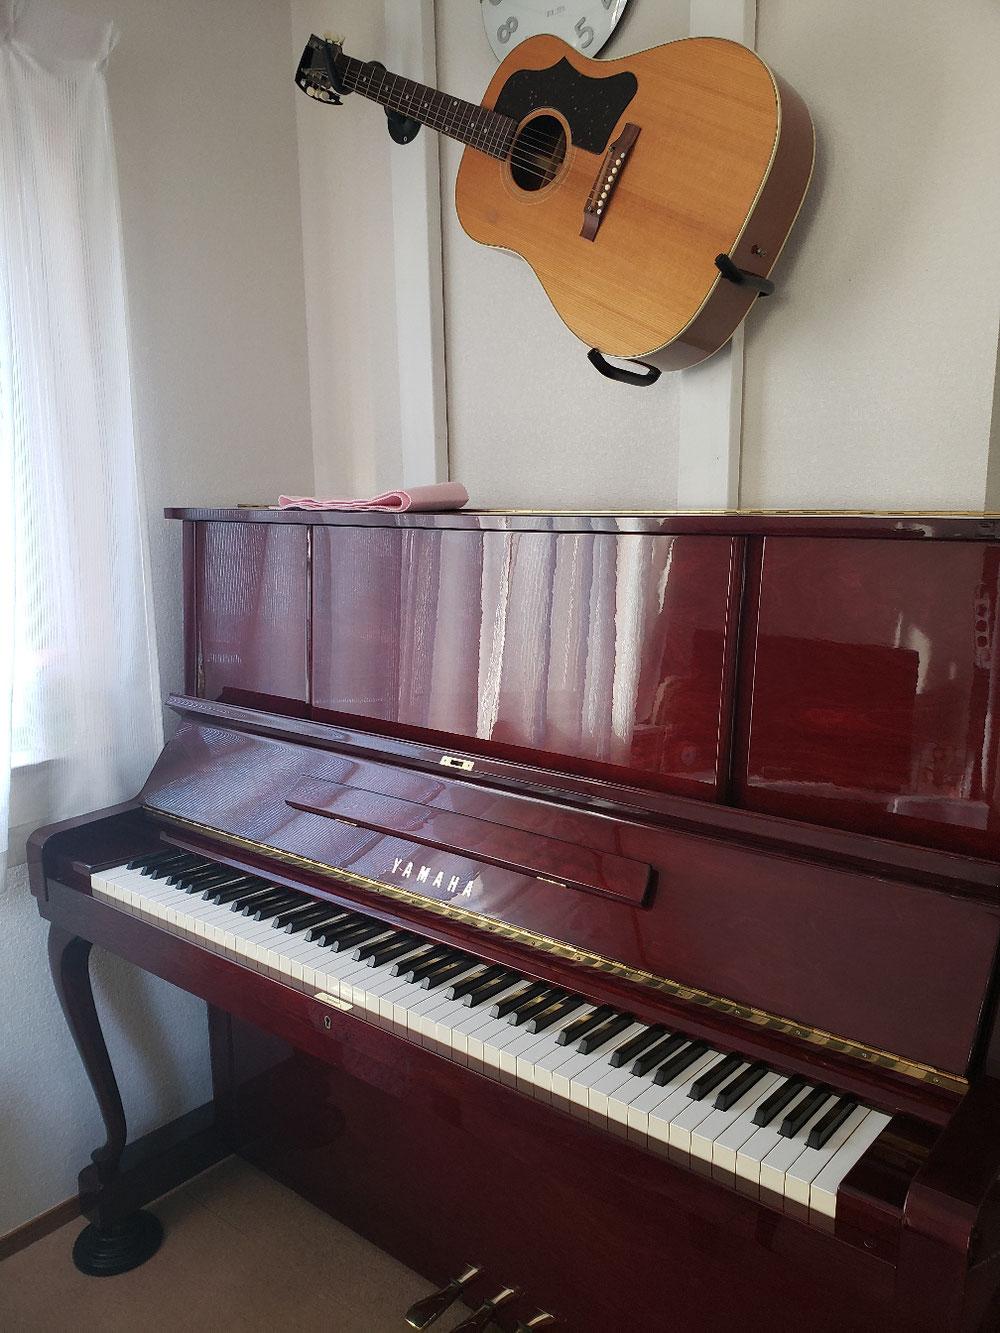 YAMAHAのピアノも。